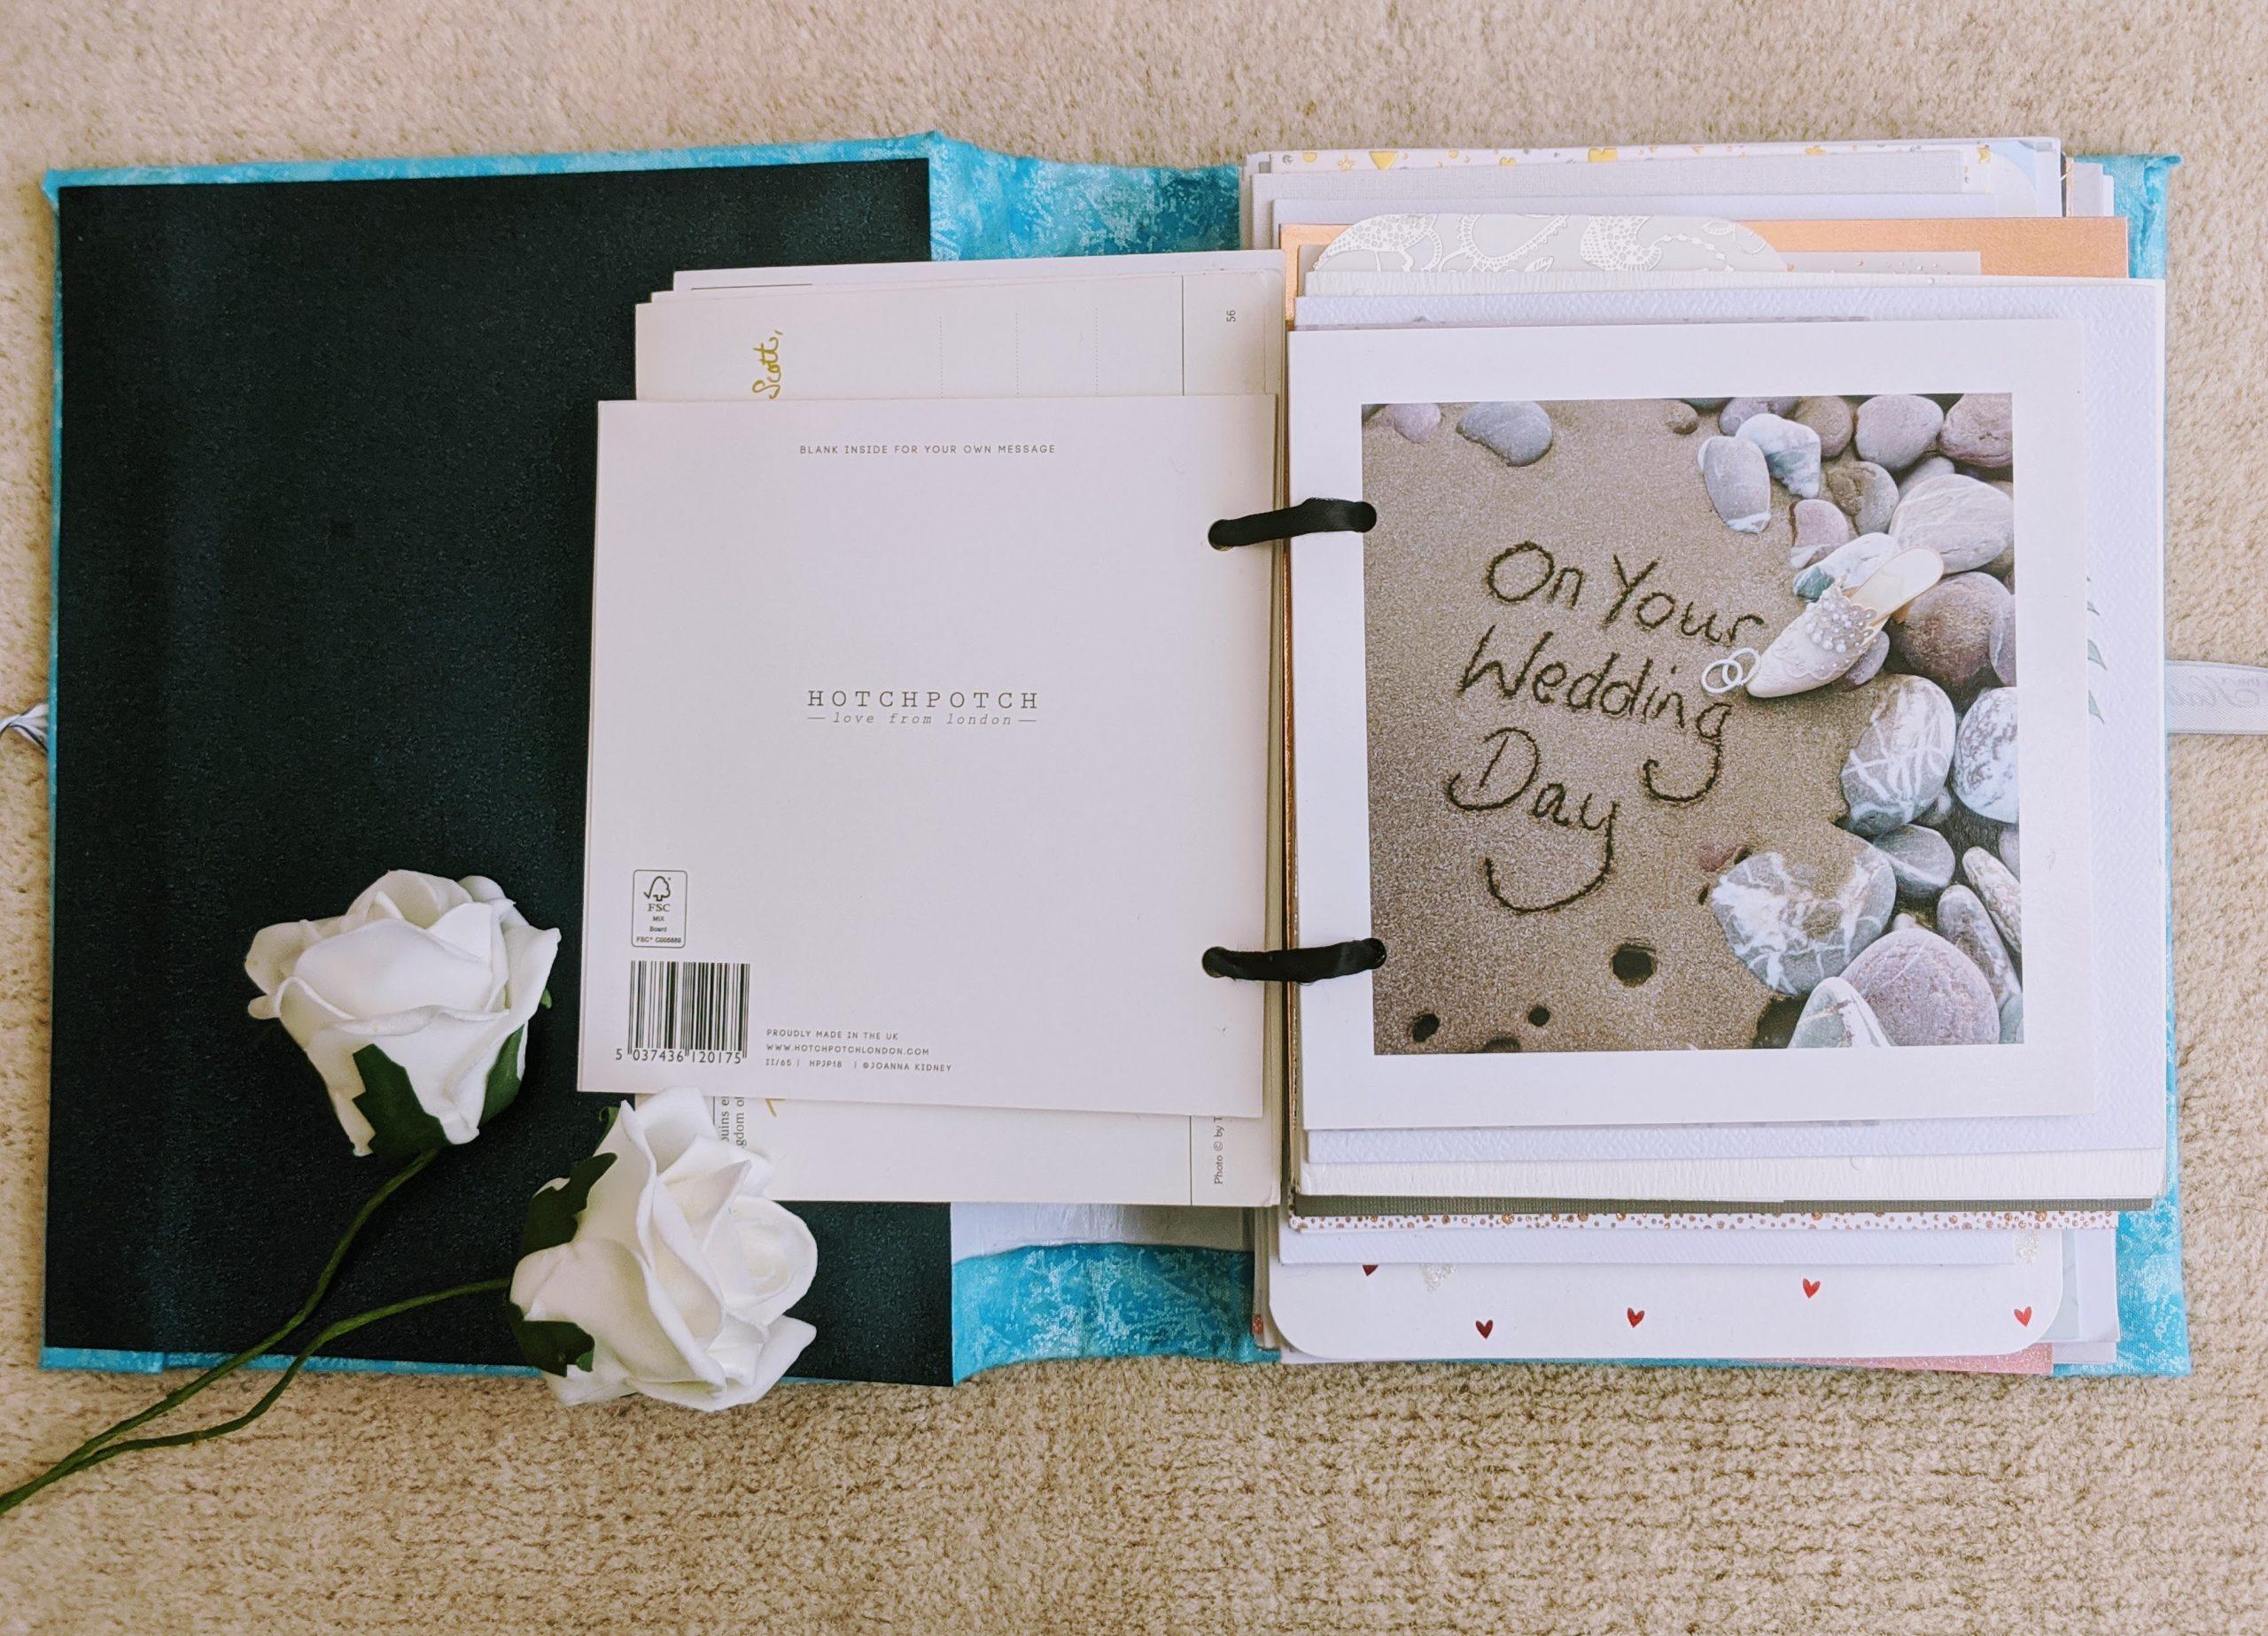 Inside the wedding card keepsake book